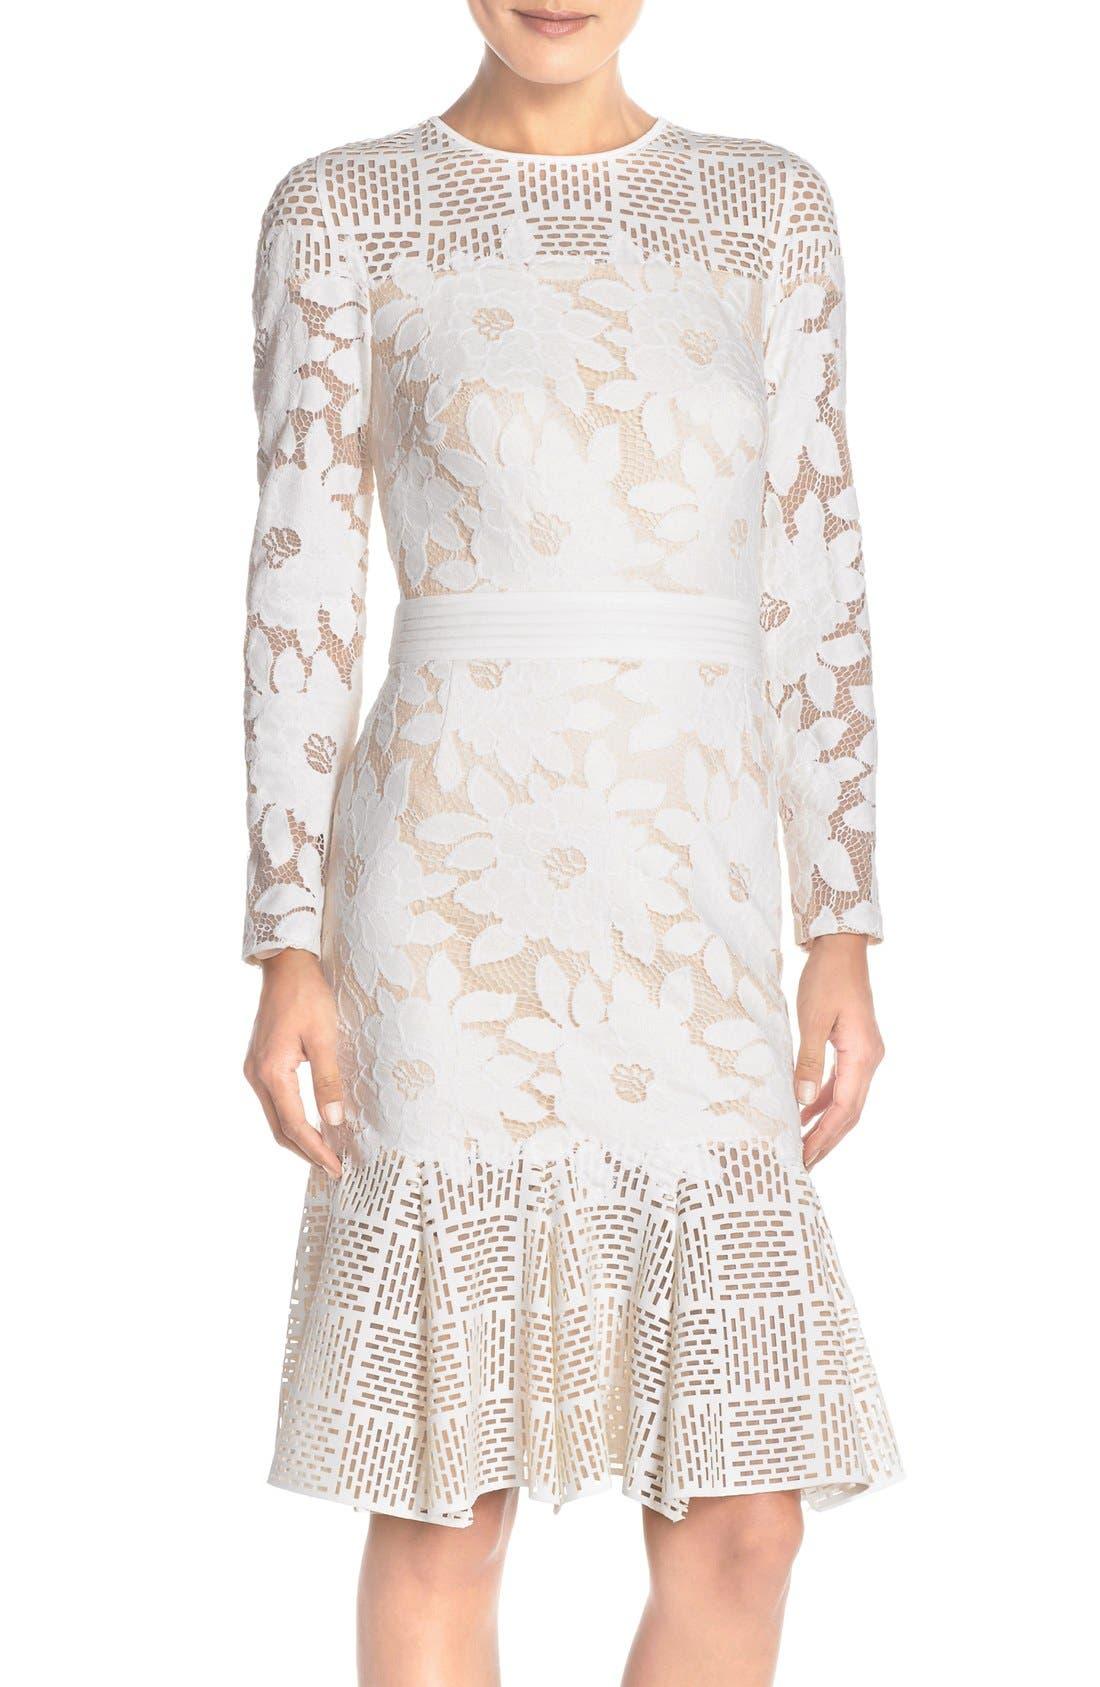 Alternate Image 1 Selected - Tadashi Shoji Lace & Cutout Neoprene Sheath Dress